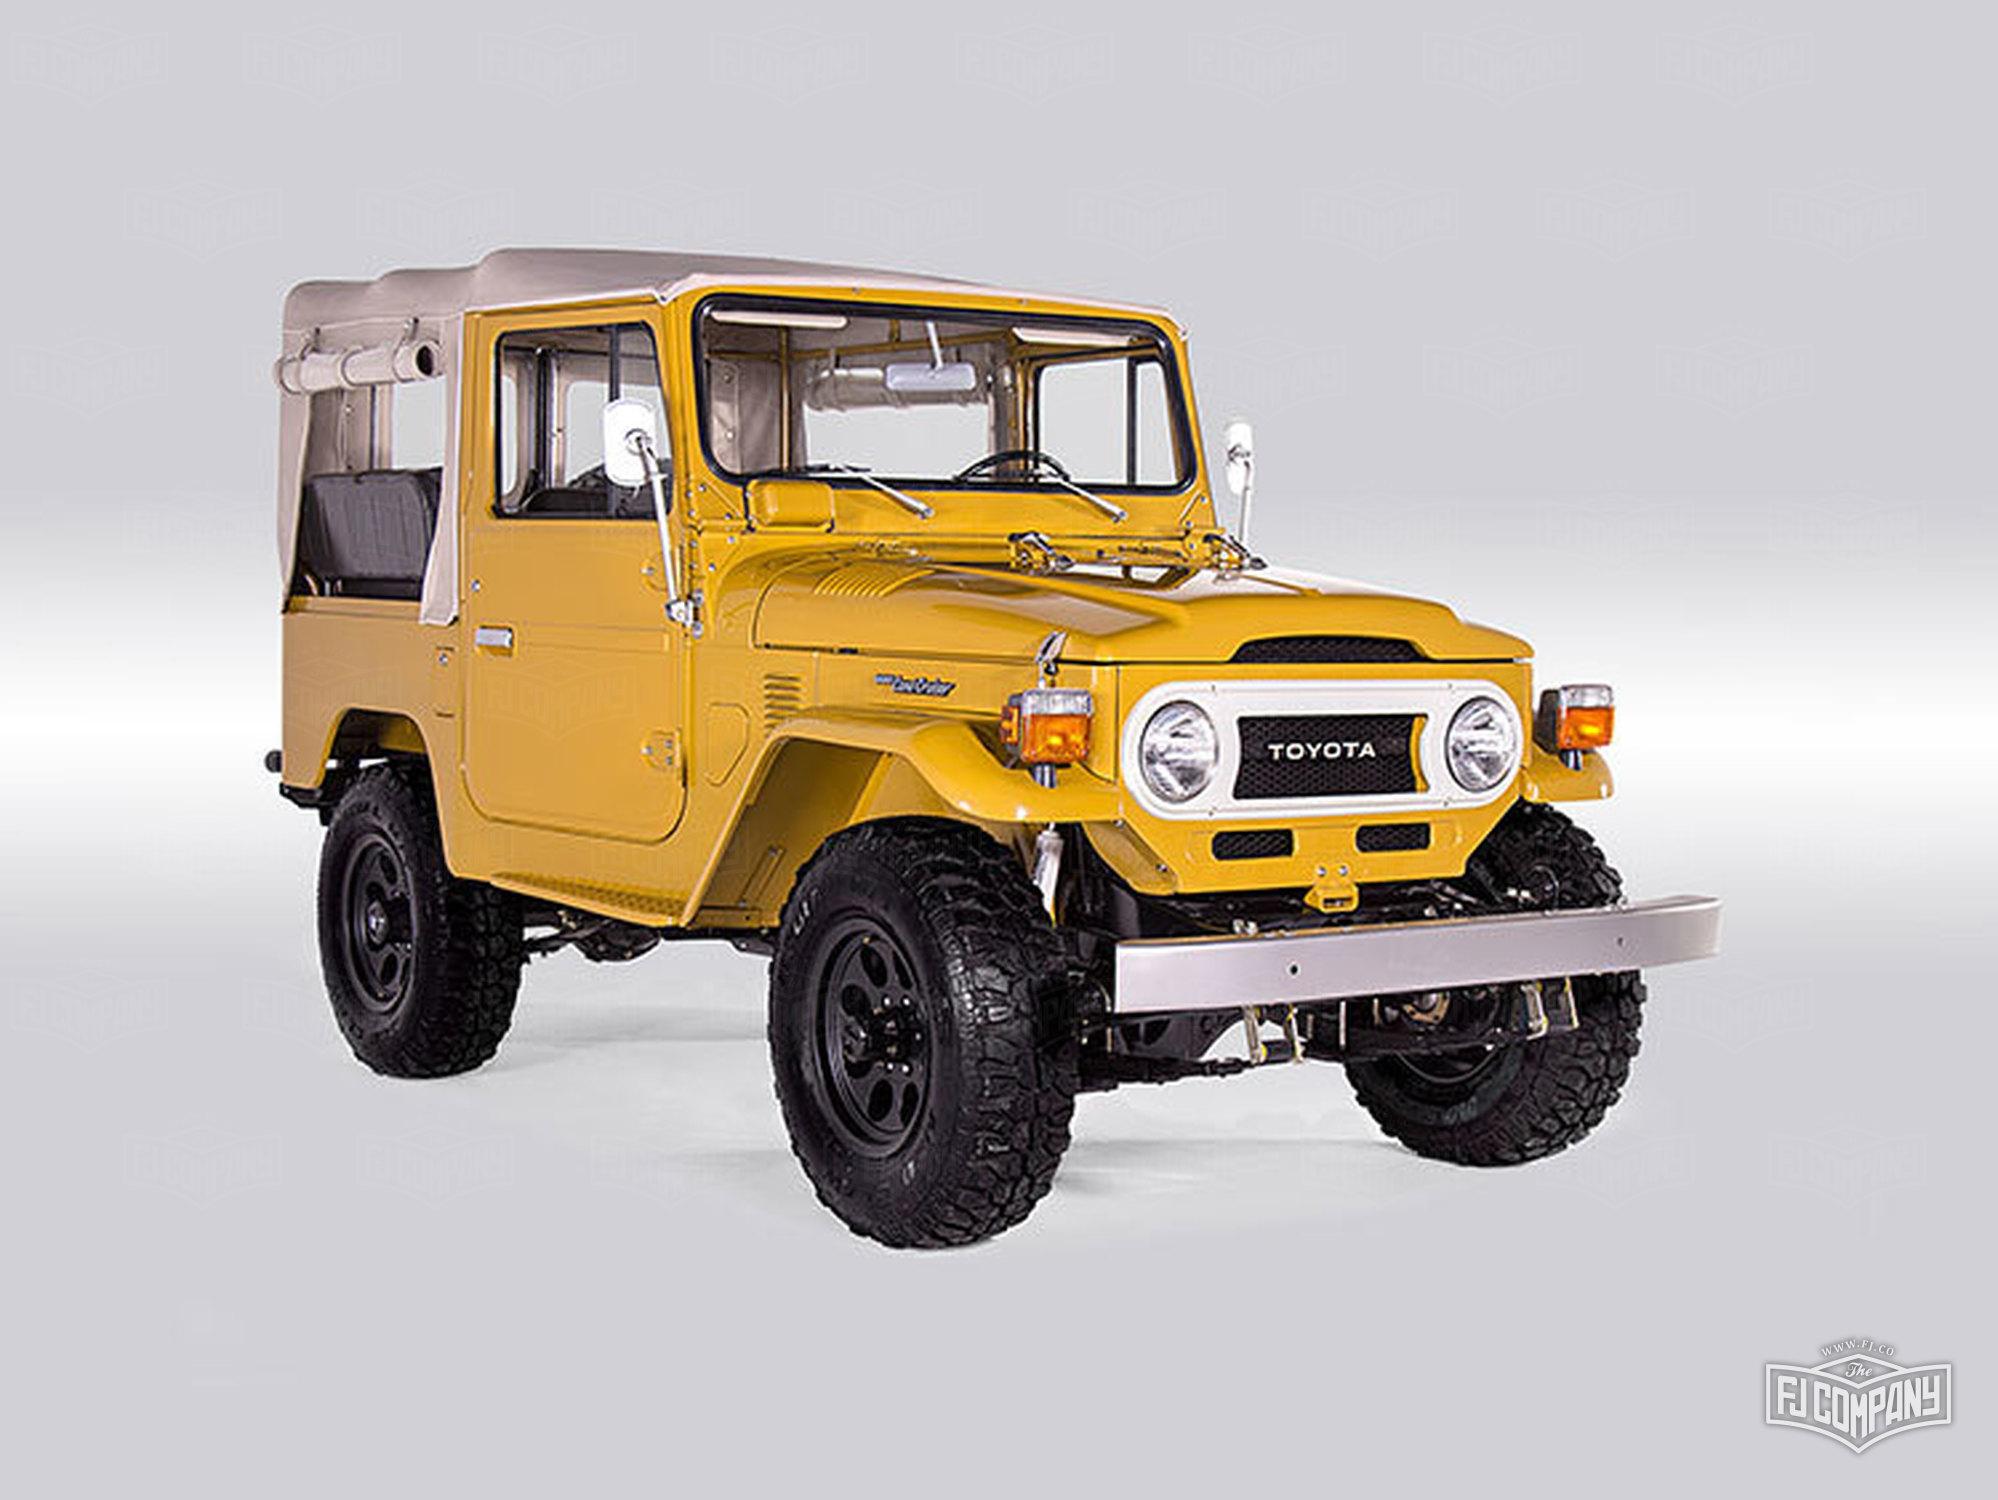 1976 FJ40 - Mustard Yellow - FJ40-225452